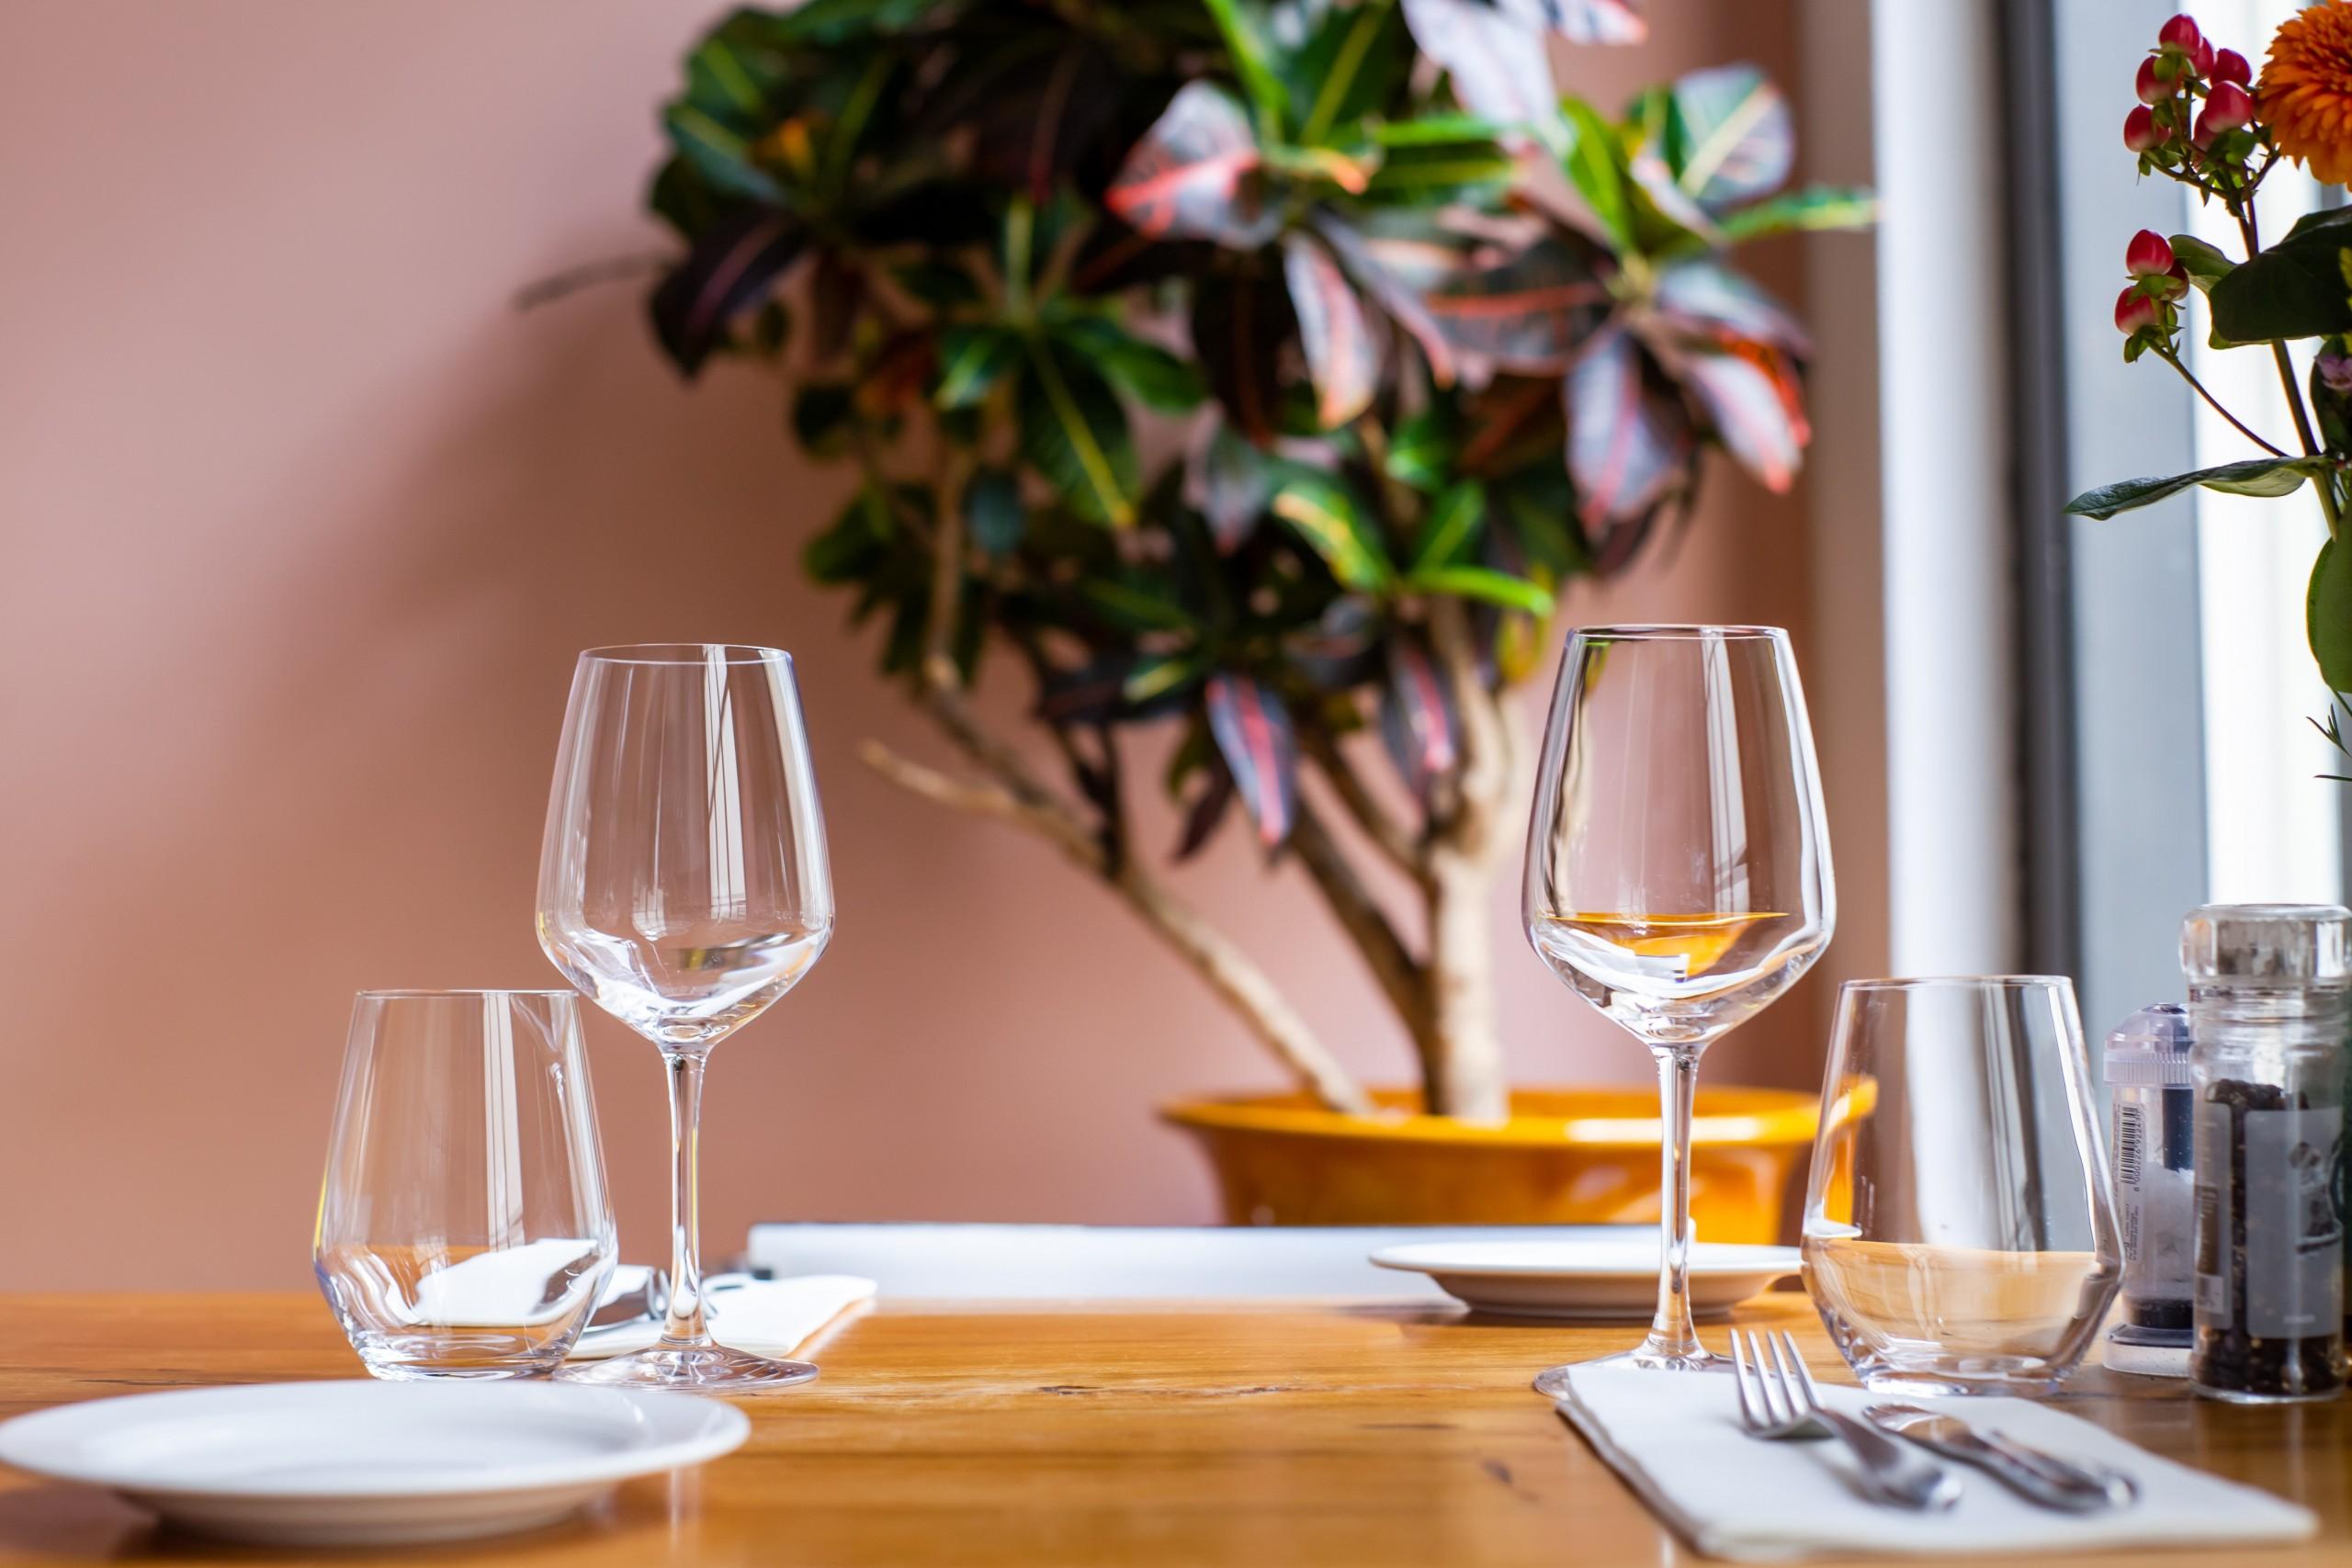 louis-hansel-restaurant-photographer-jjkOV8-L-1M-unsplash